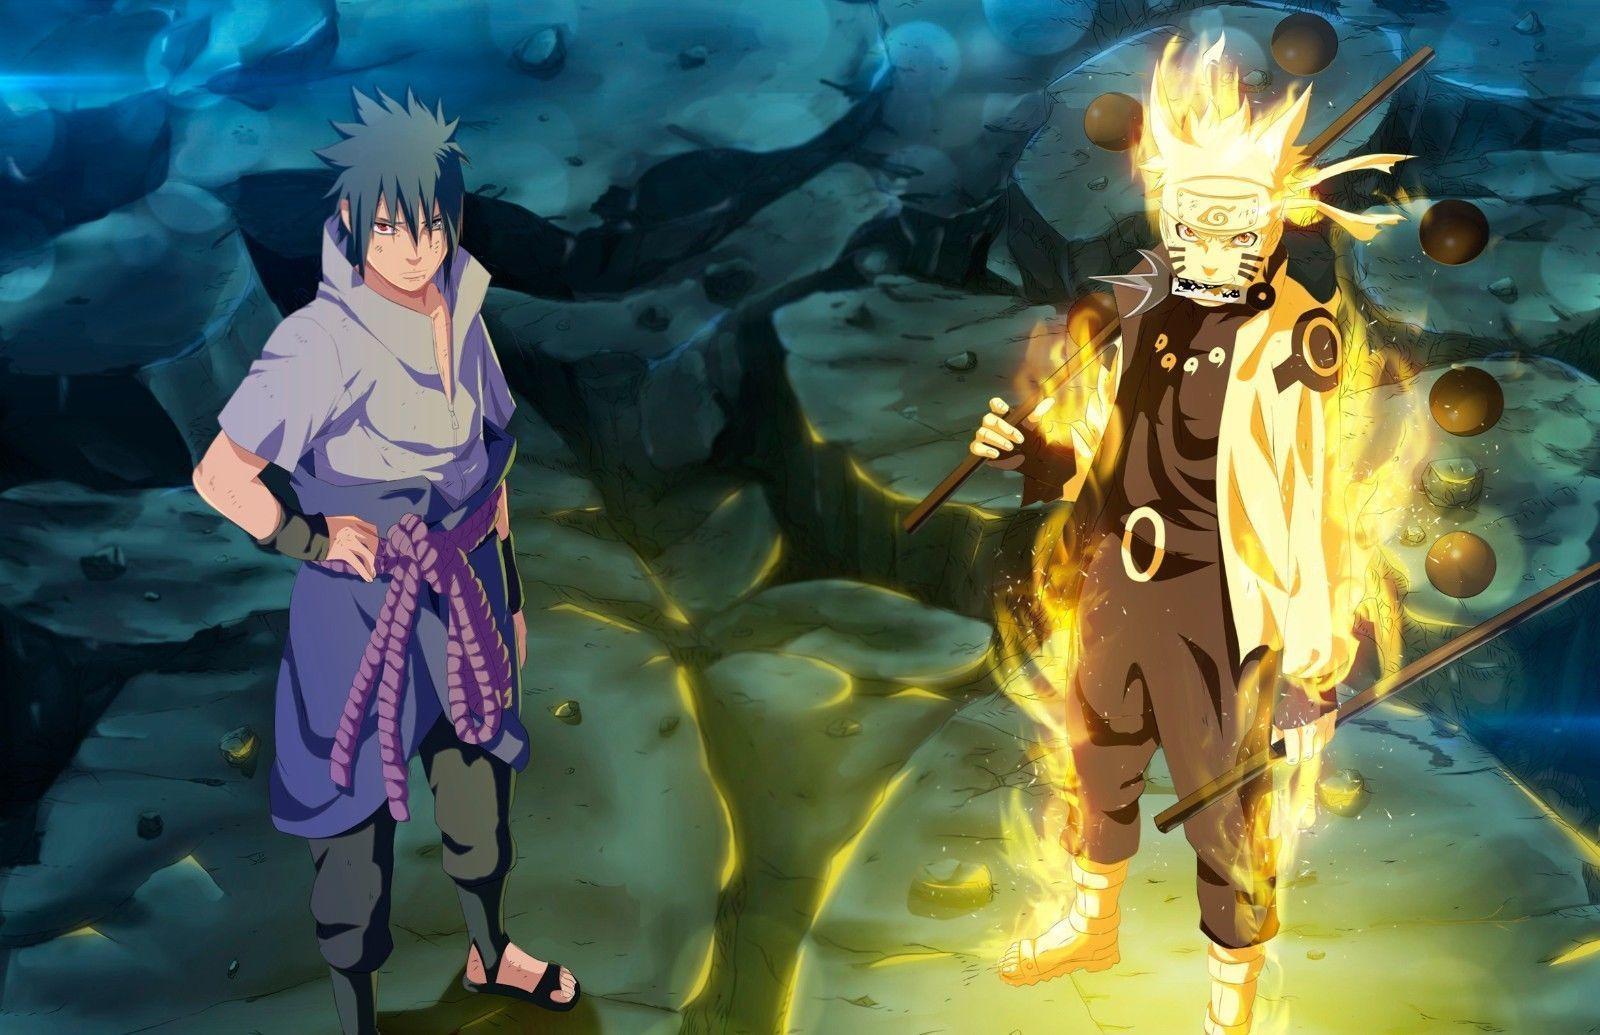 Großhandel Naruto Sasuke Art Silk Poster 24x36inch 60x90 Cm Von Chuy8988,  9,63 € Auf De.Dhgate.Com